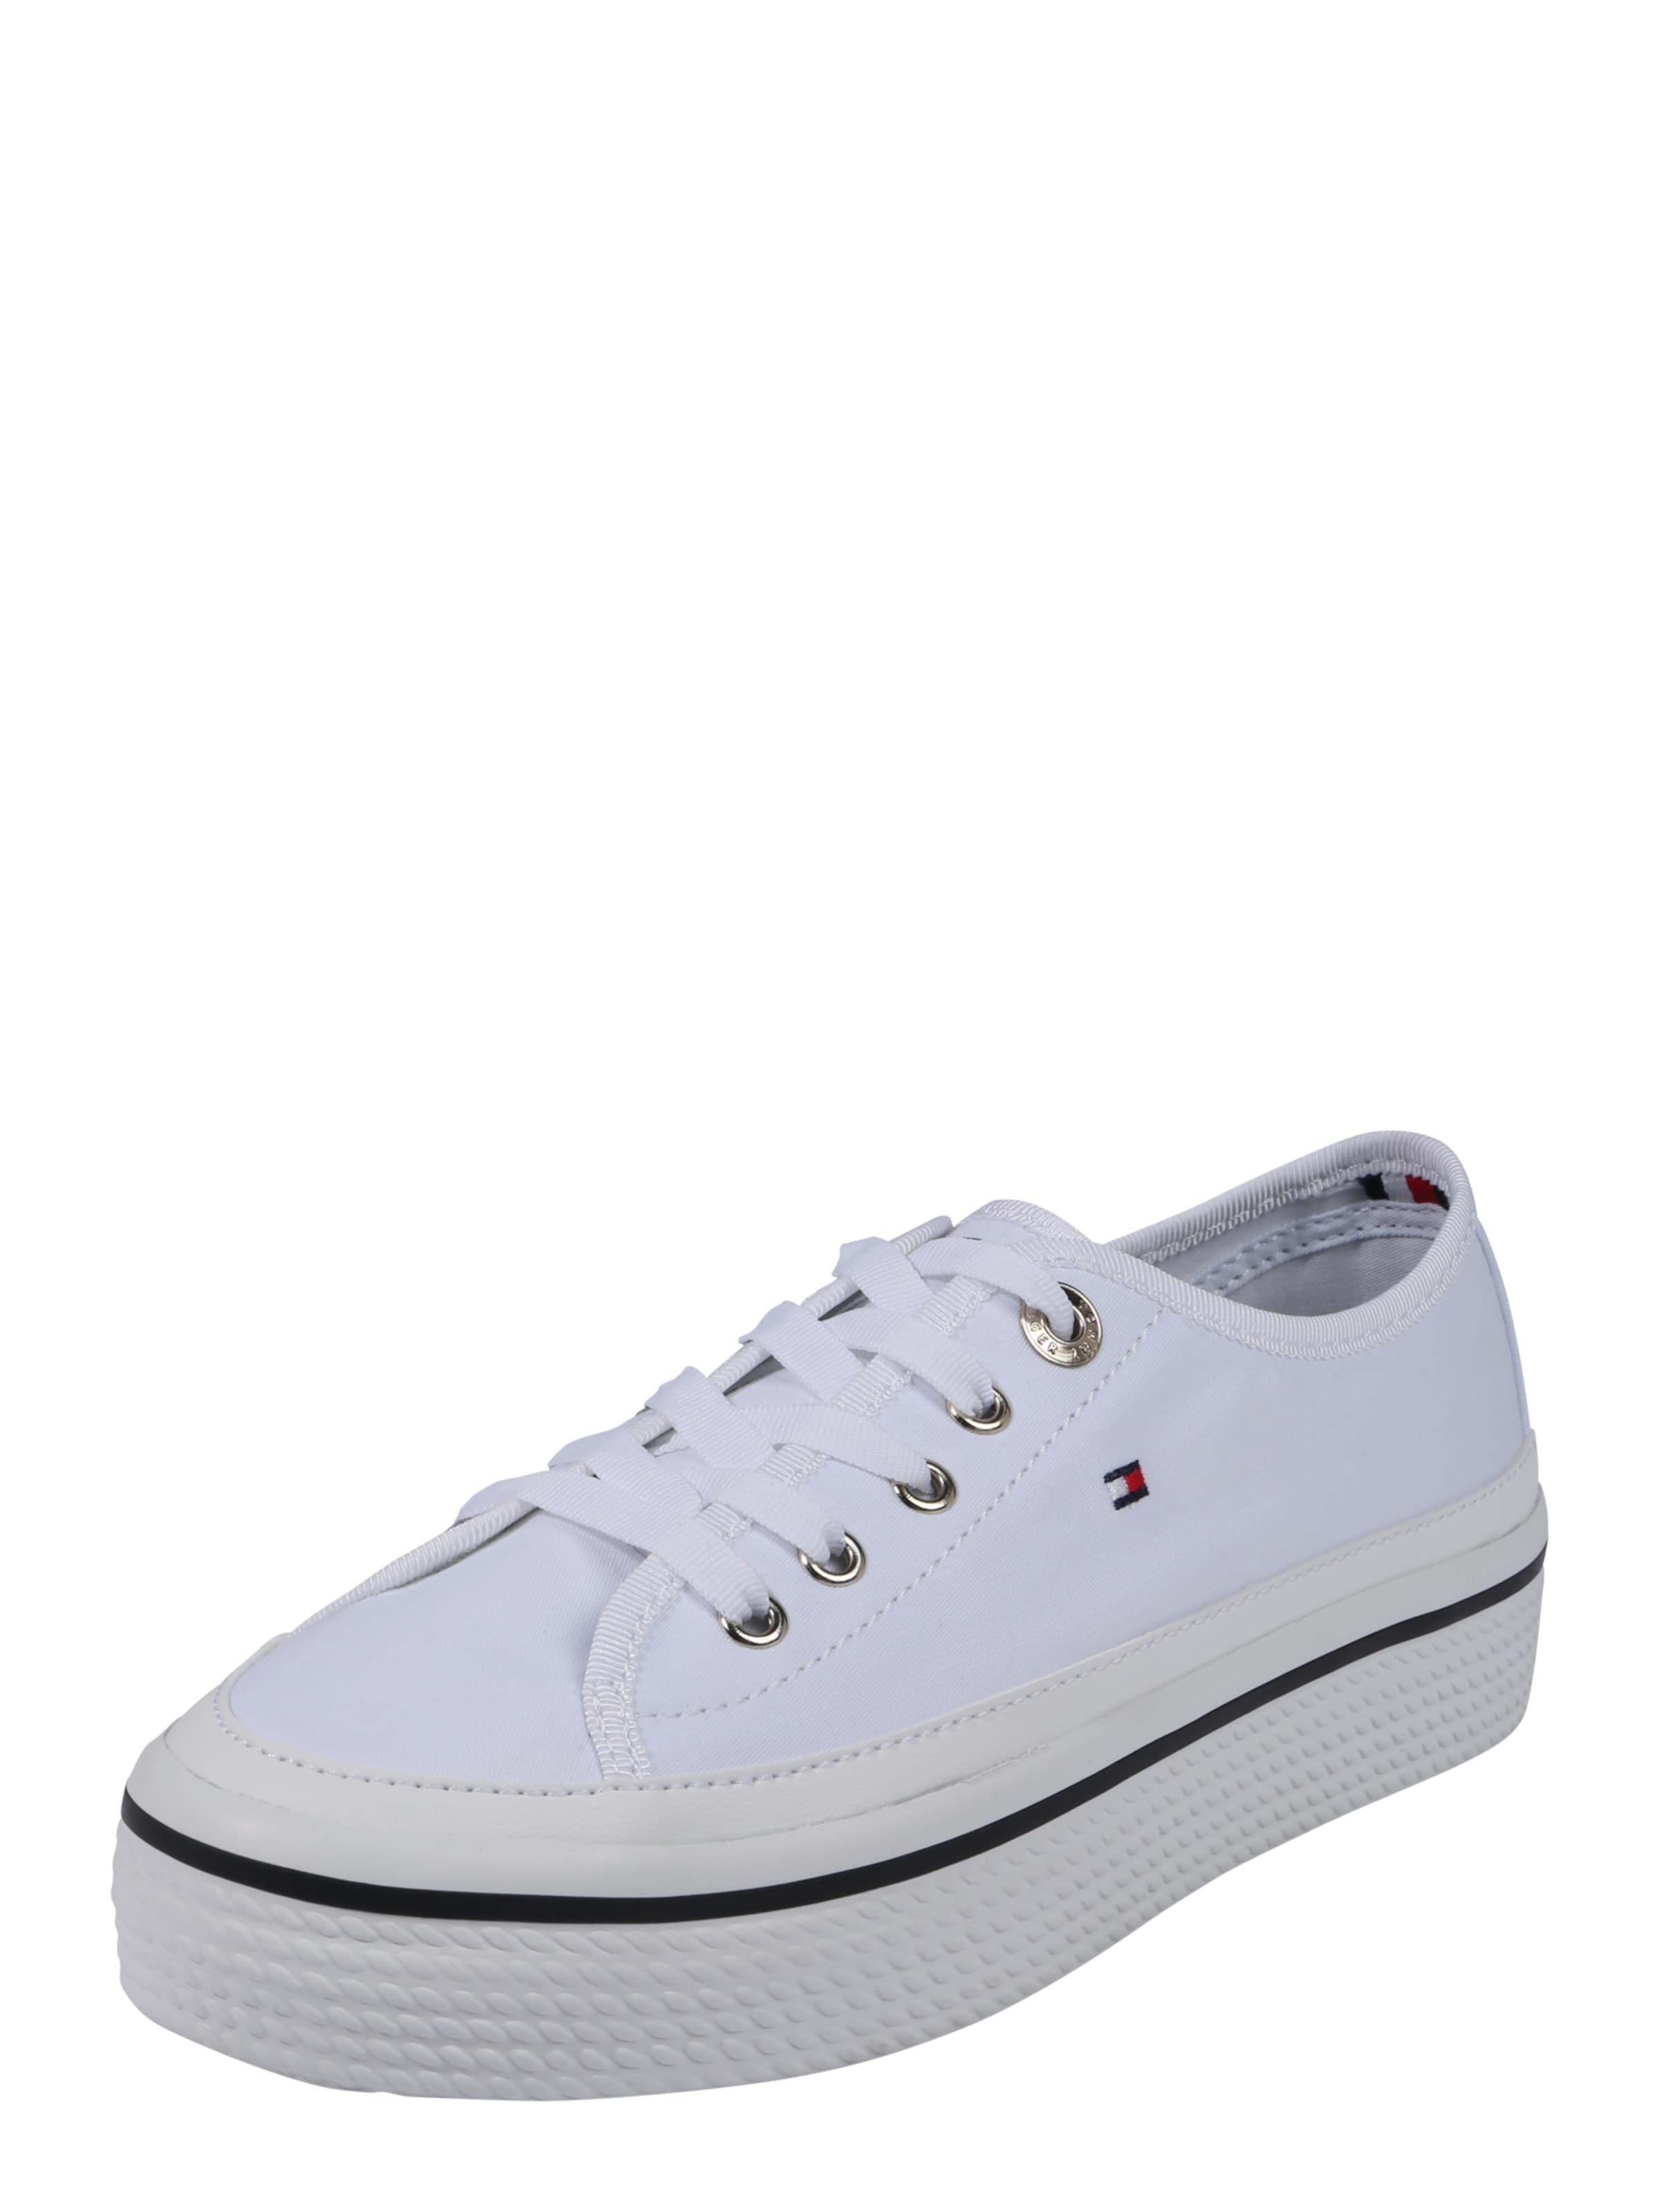 TOMMY HILFIGER Sneaker CORPORATE FLATFORM Hohe Qualität